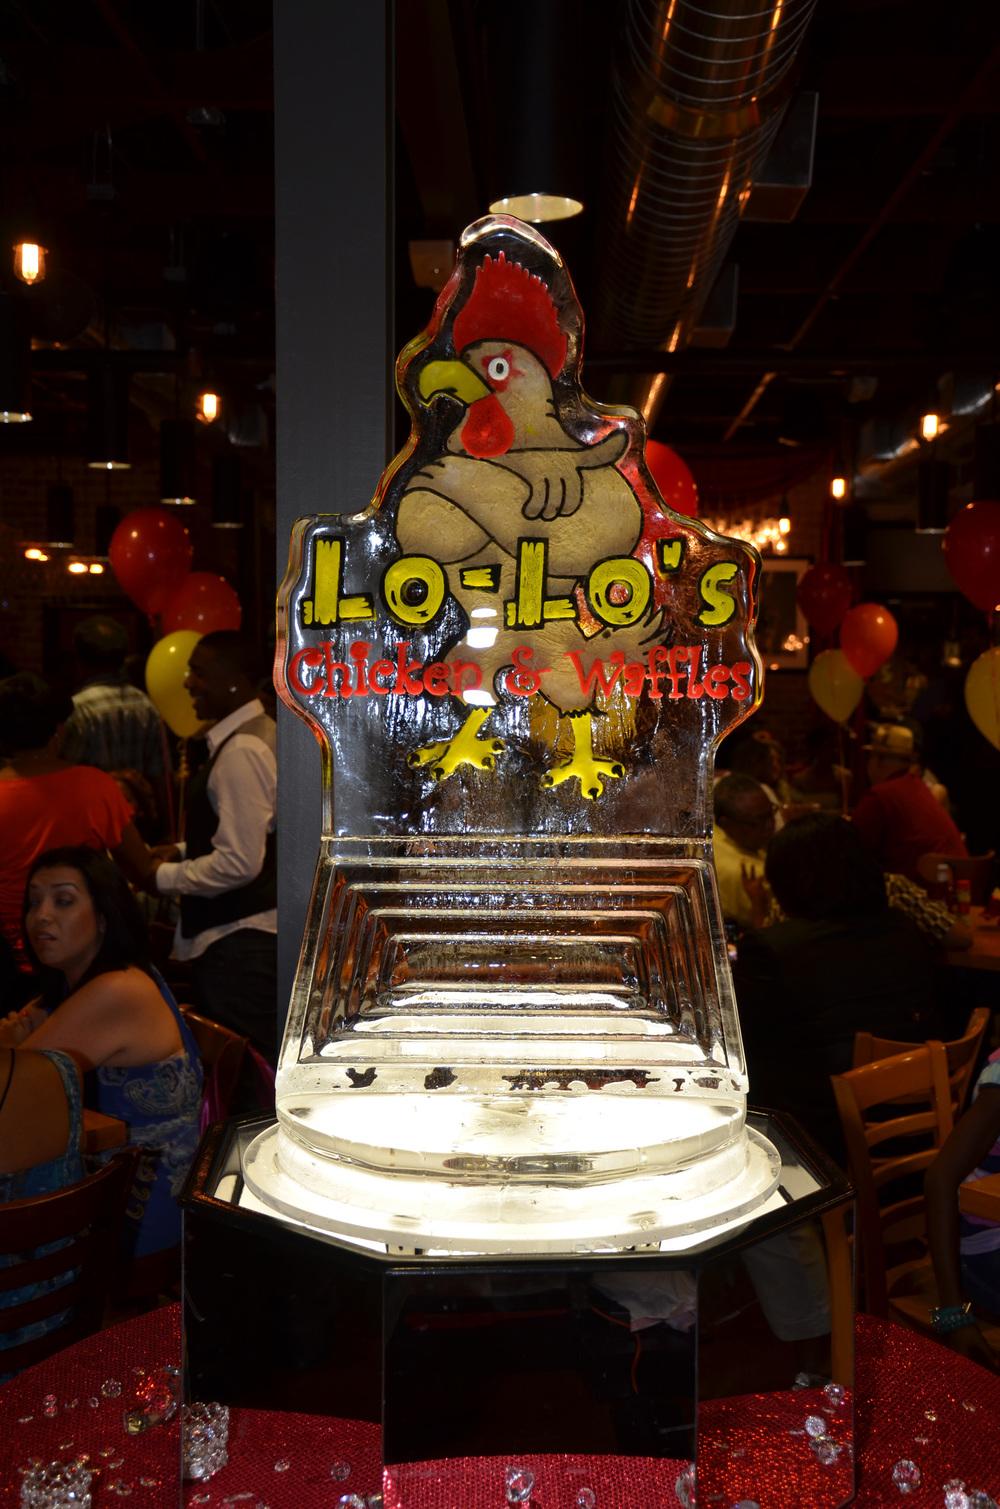 Lolos-Grand-Opening-138.jpg